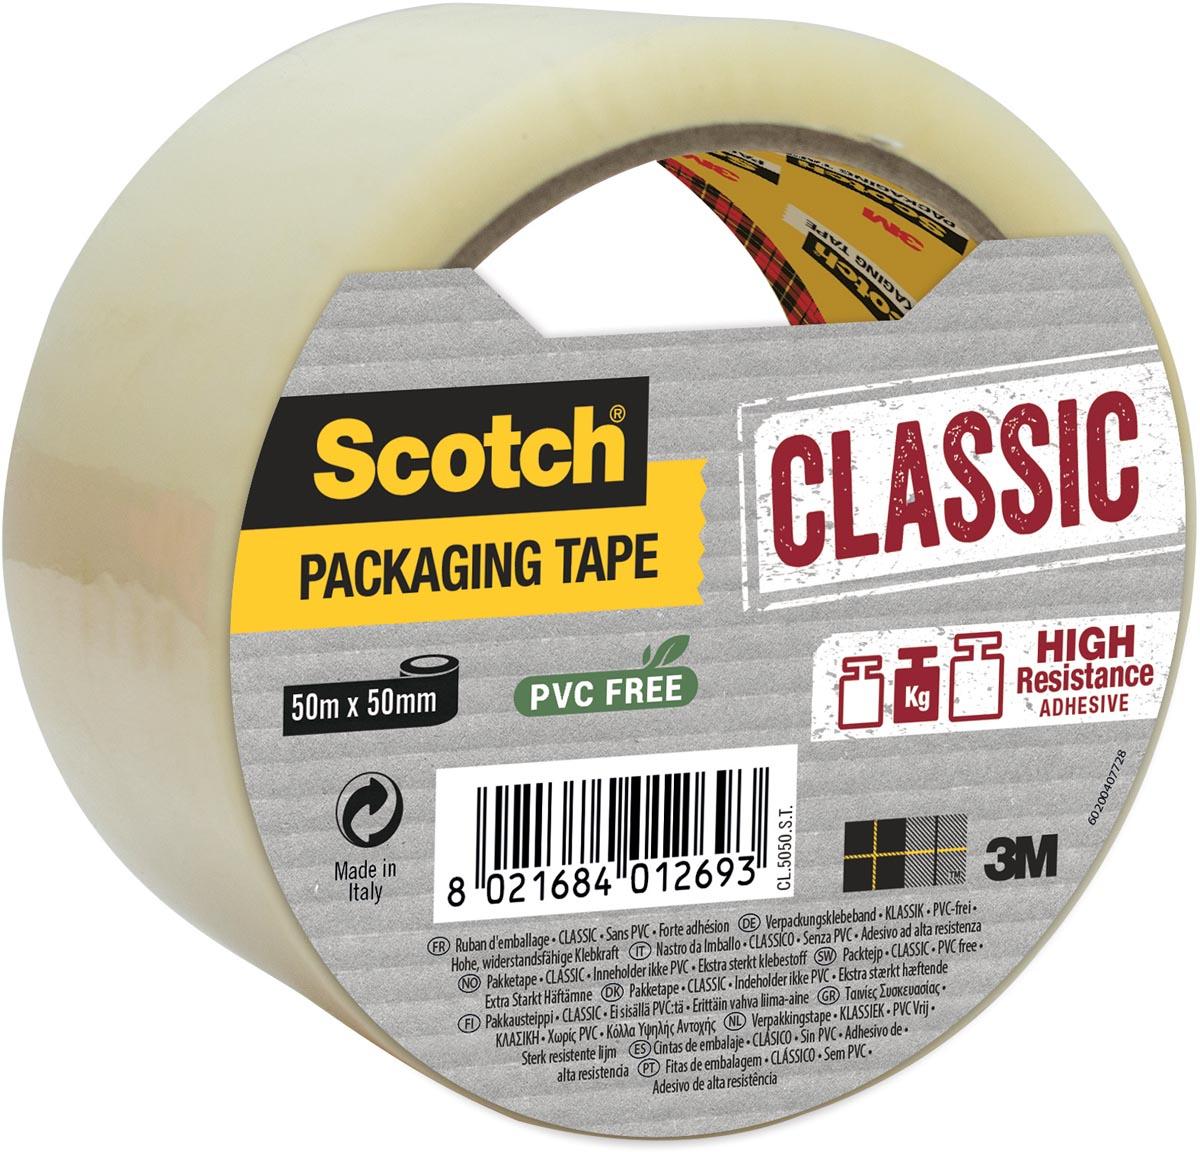 Scotch verpakkingsplakband, ft 50 mm x 50 m, PP, transparant, individueel verpakt